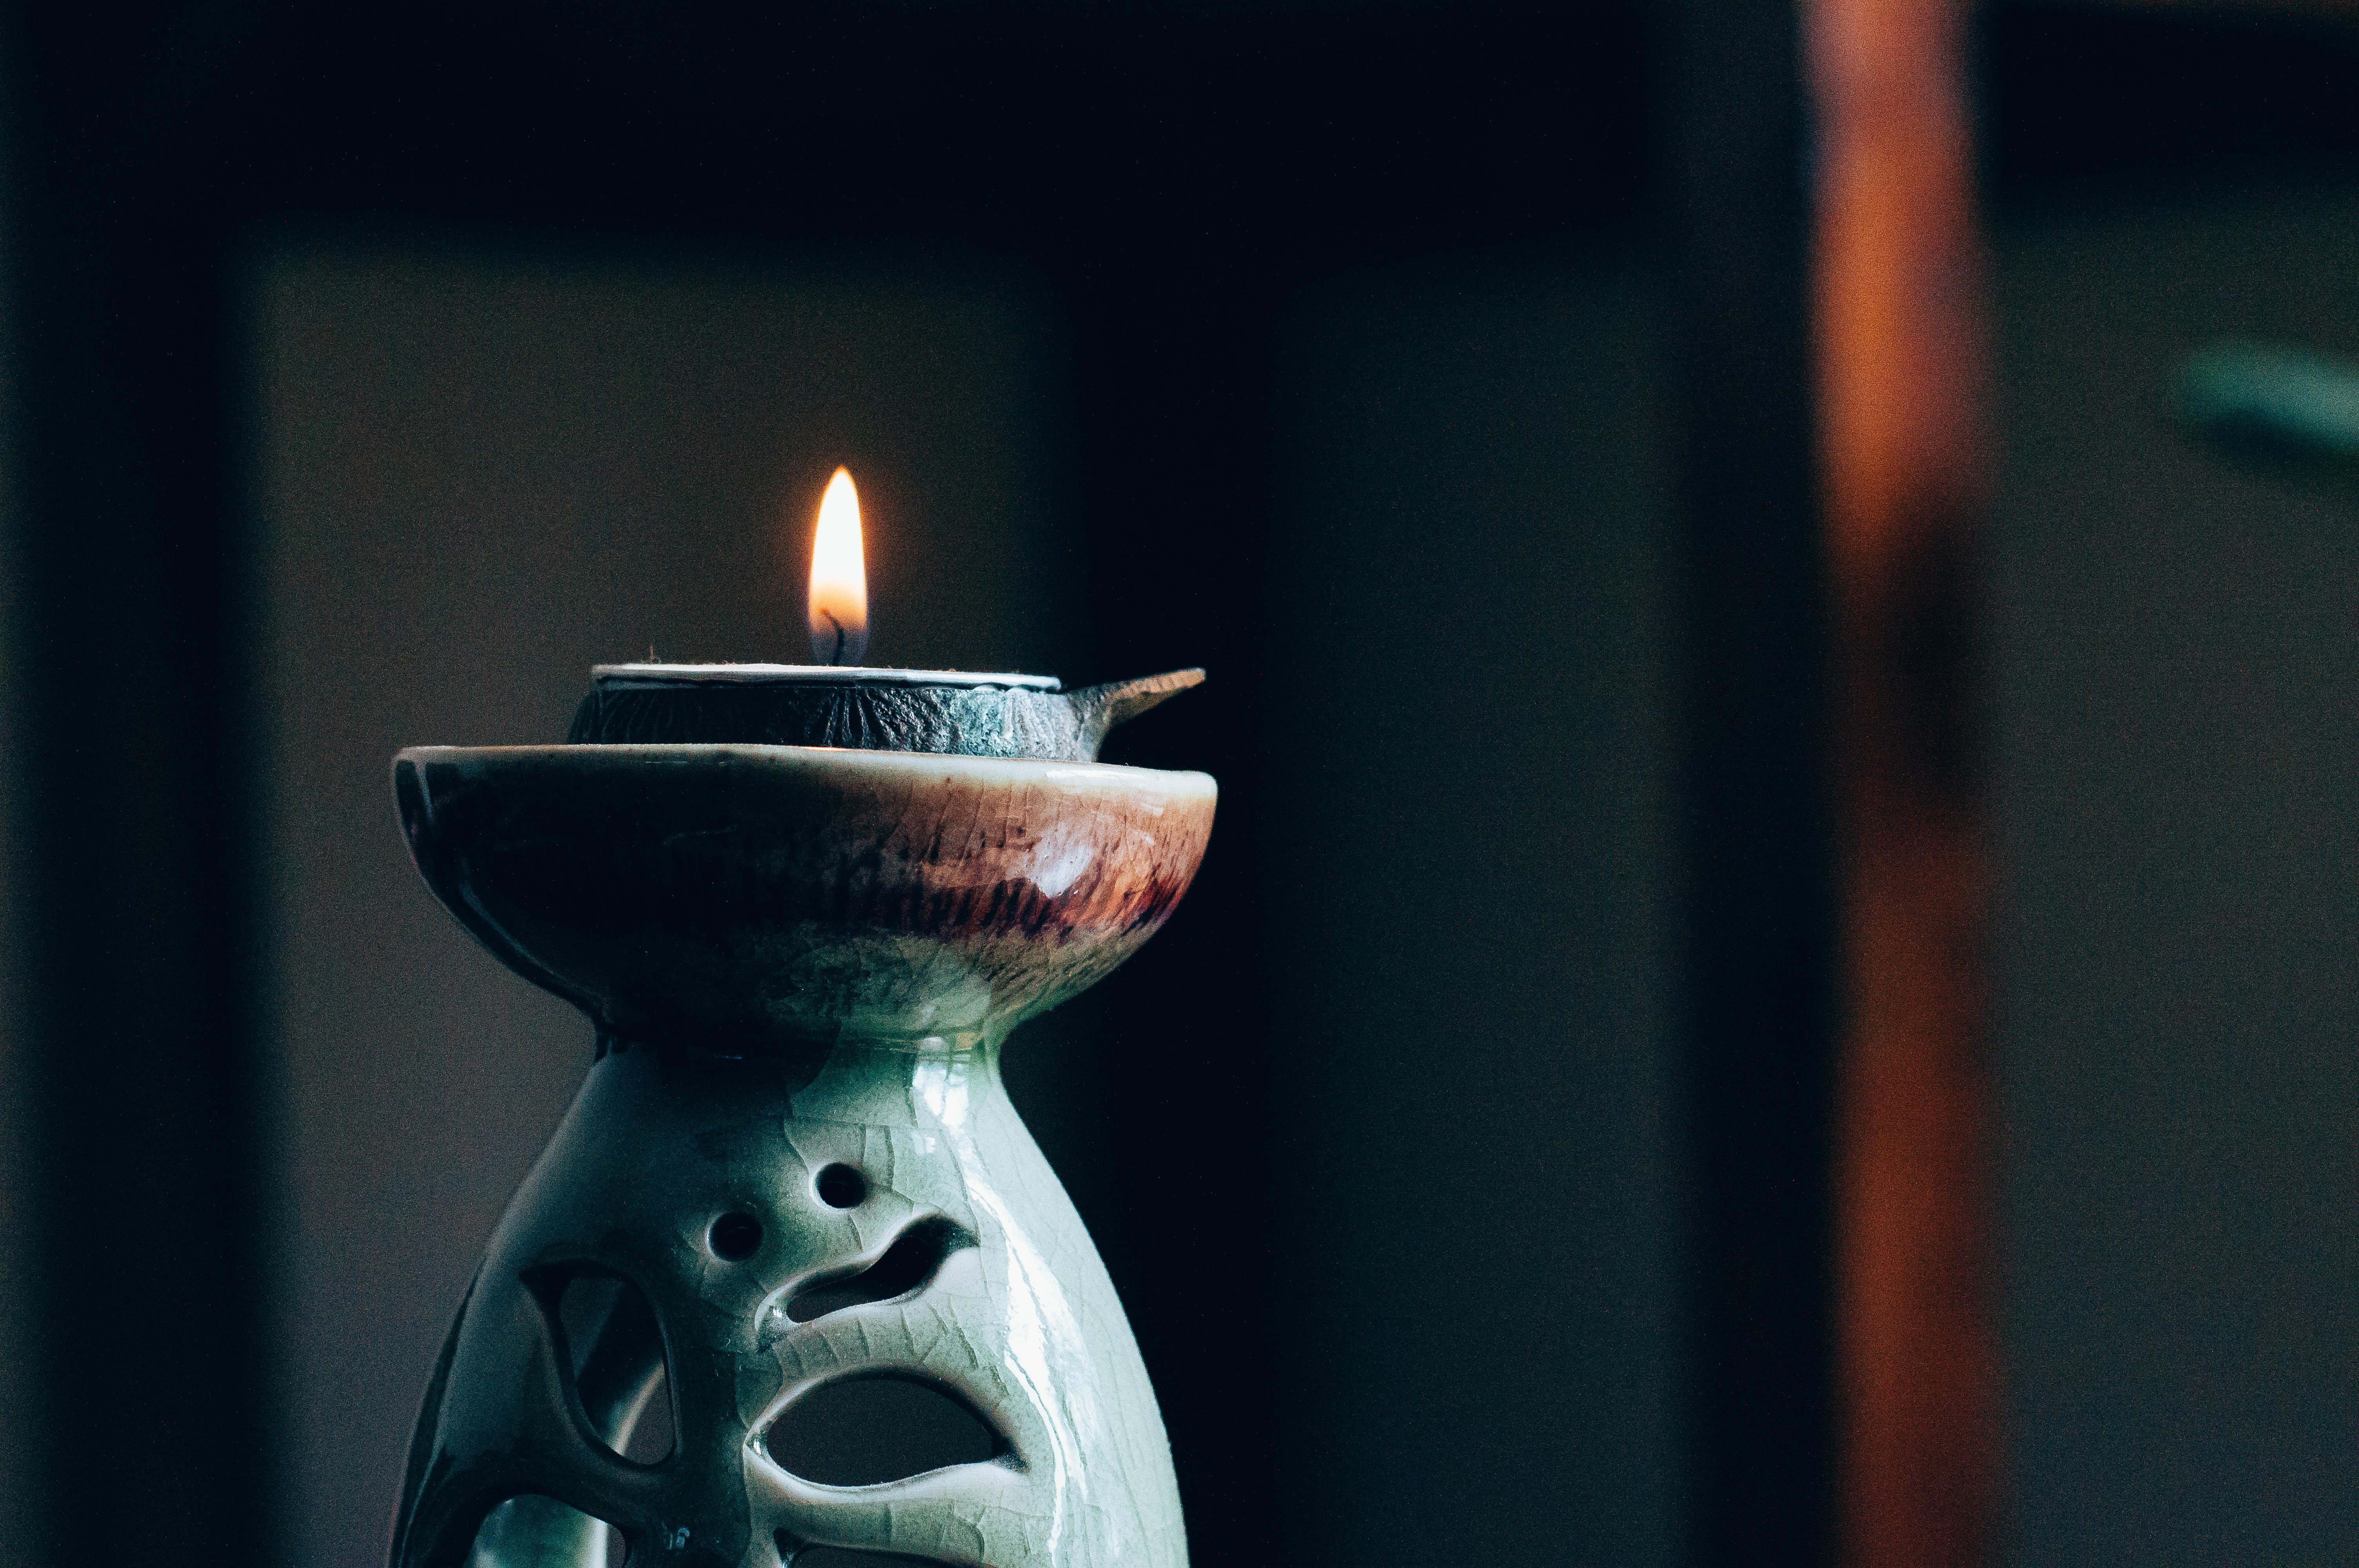 Zen & candlelight